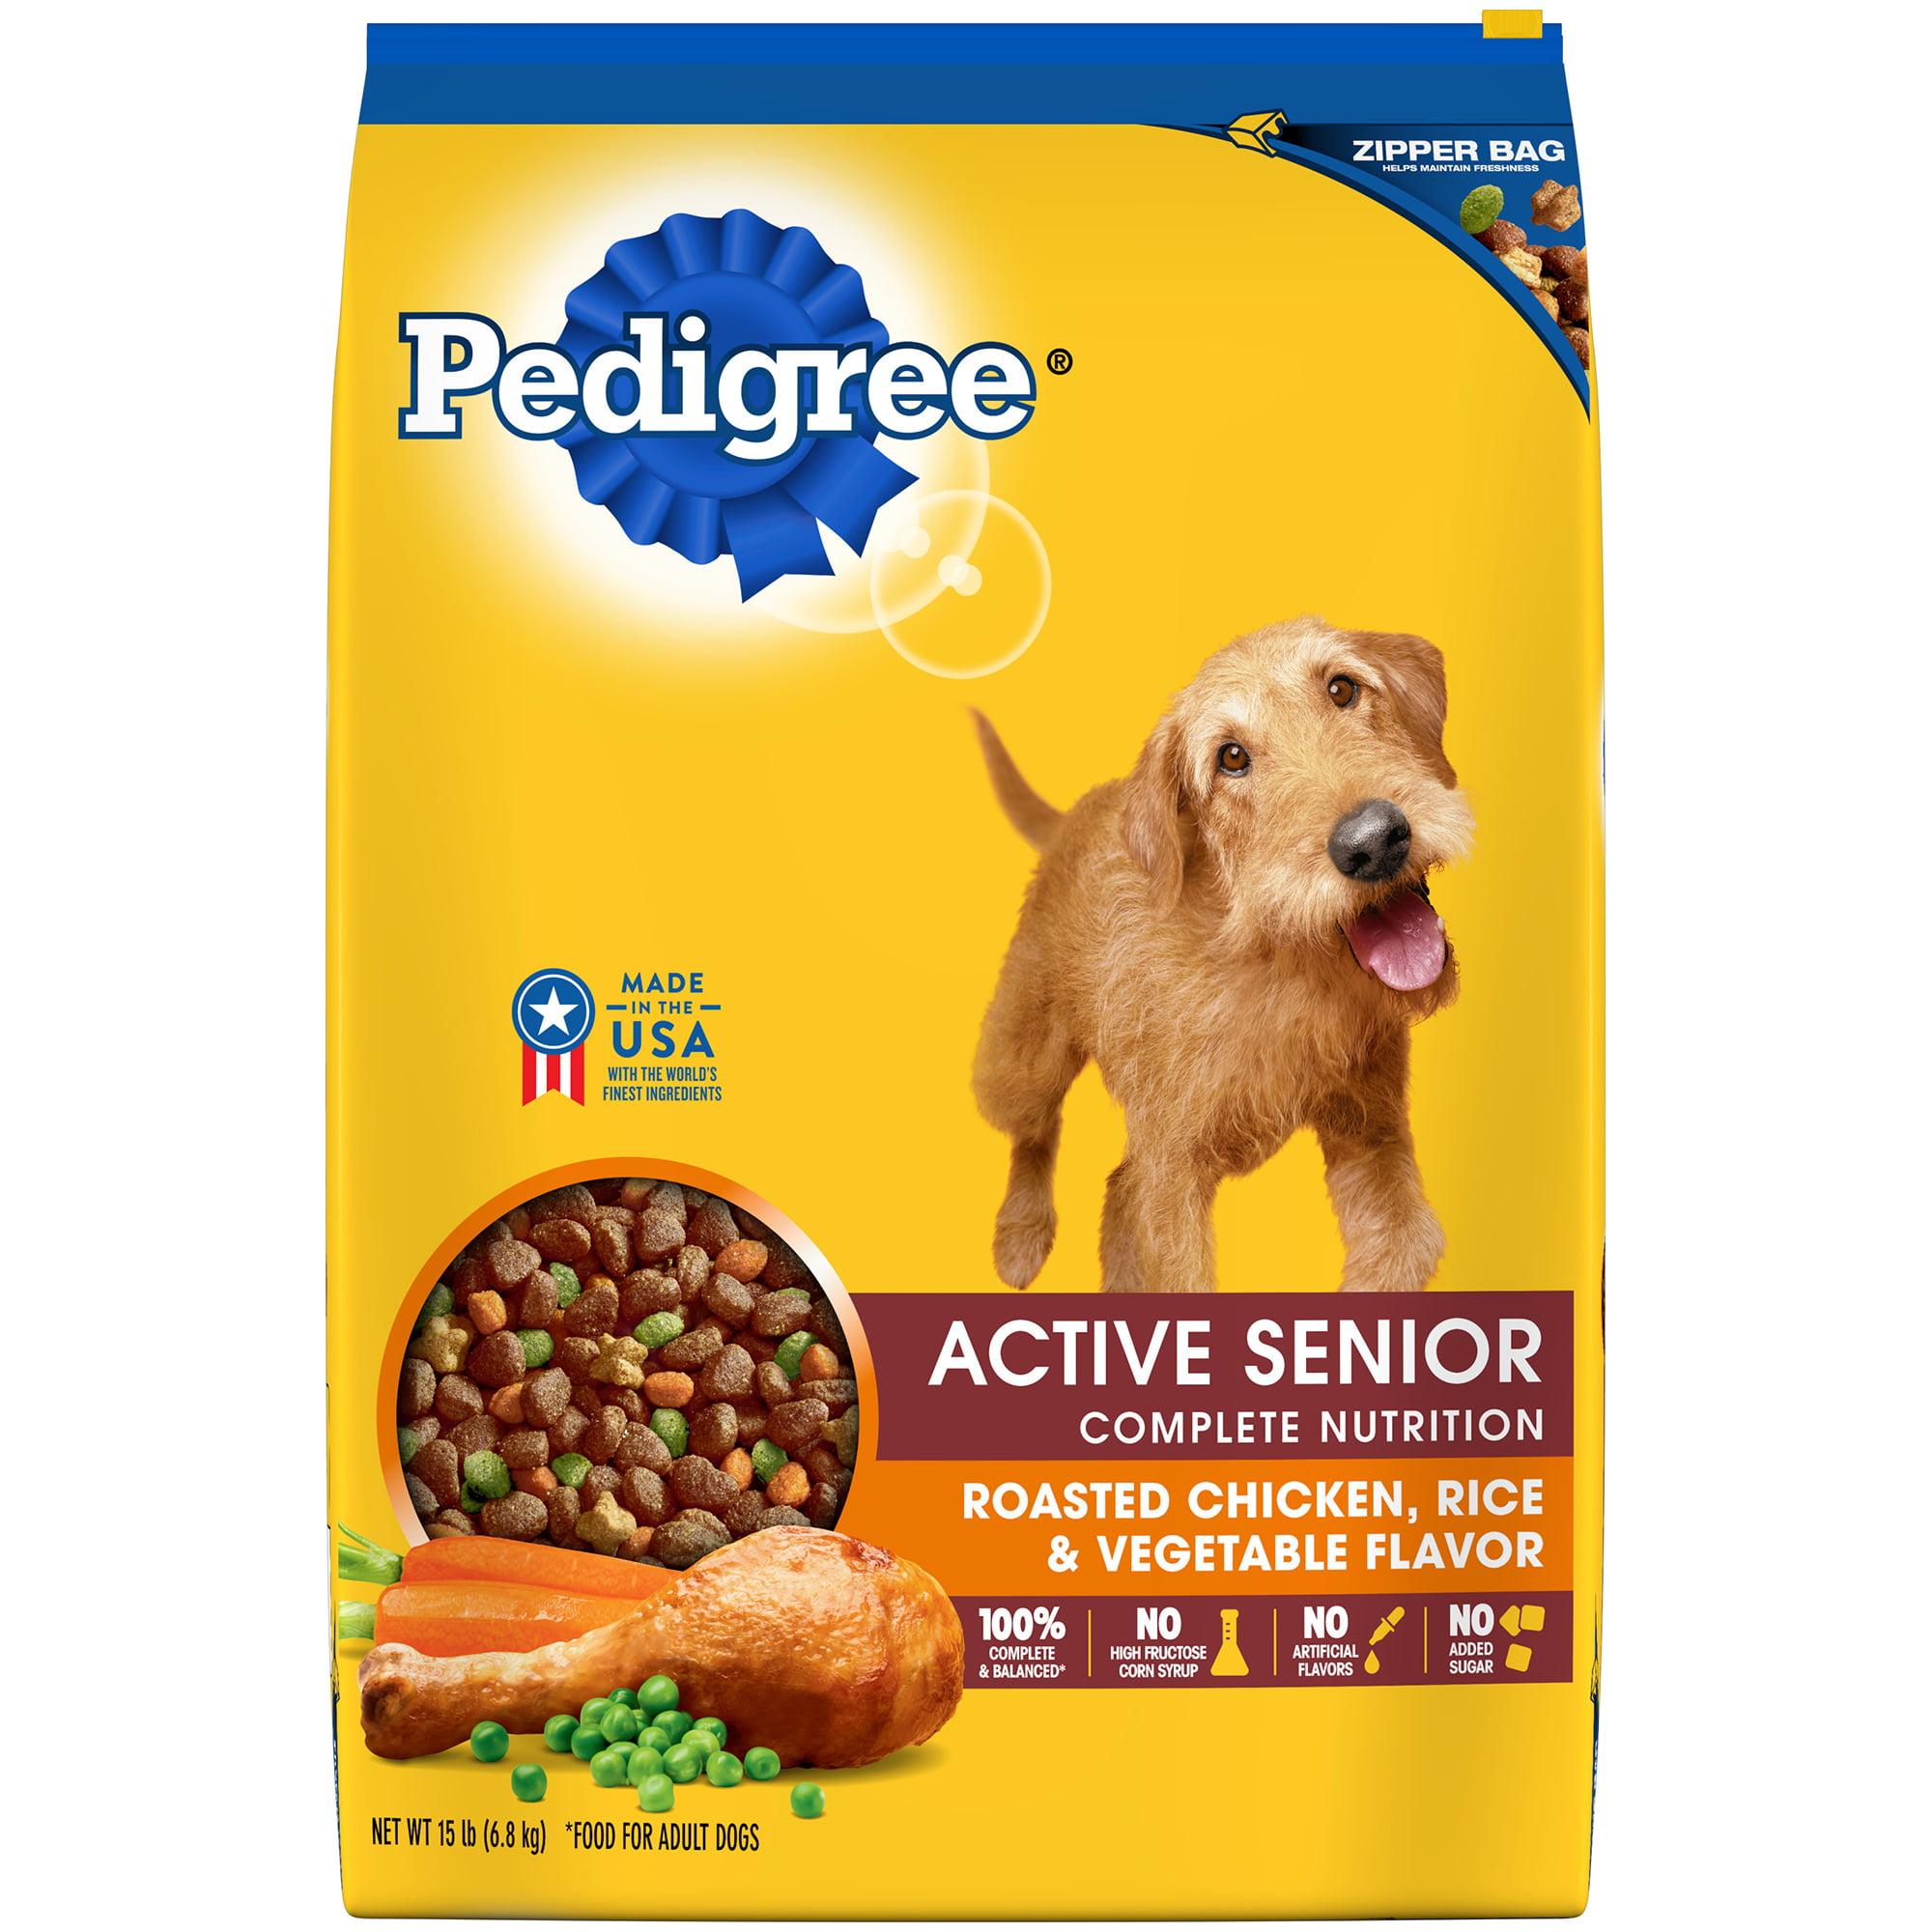 Pedigree Active Senior Roasted Chicken, Rice & Vegetable Flavor Dry Dog Food 15 Pounds